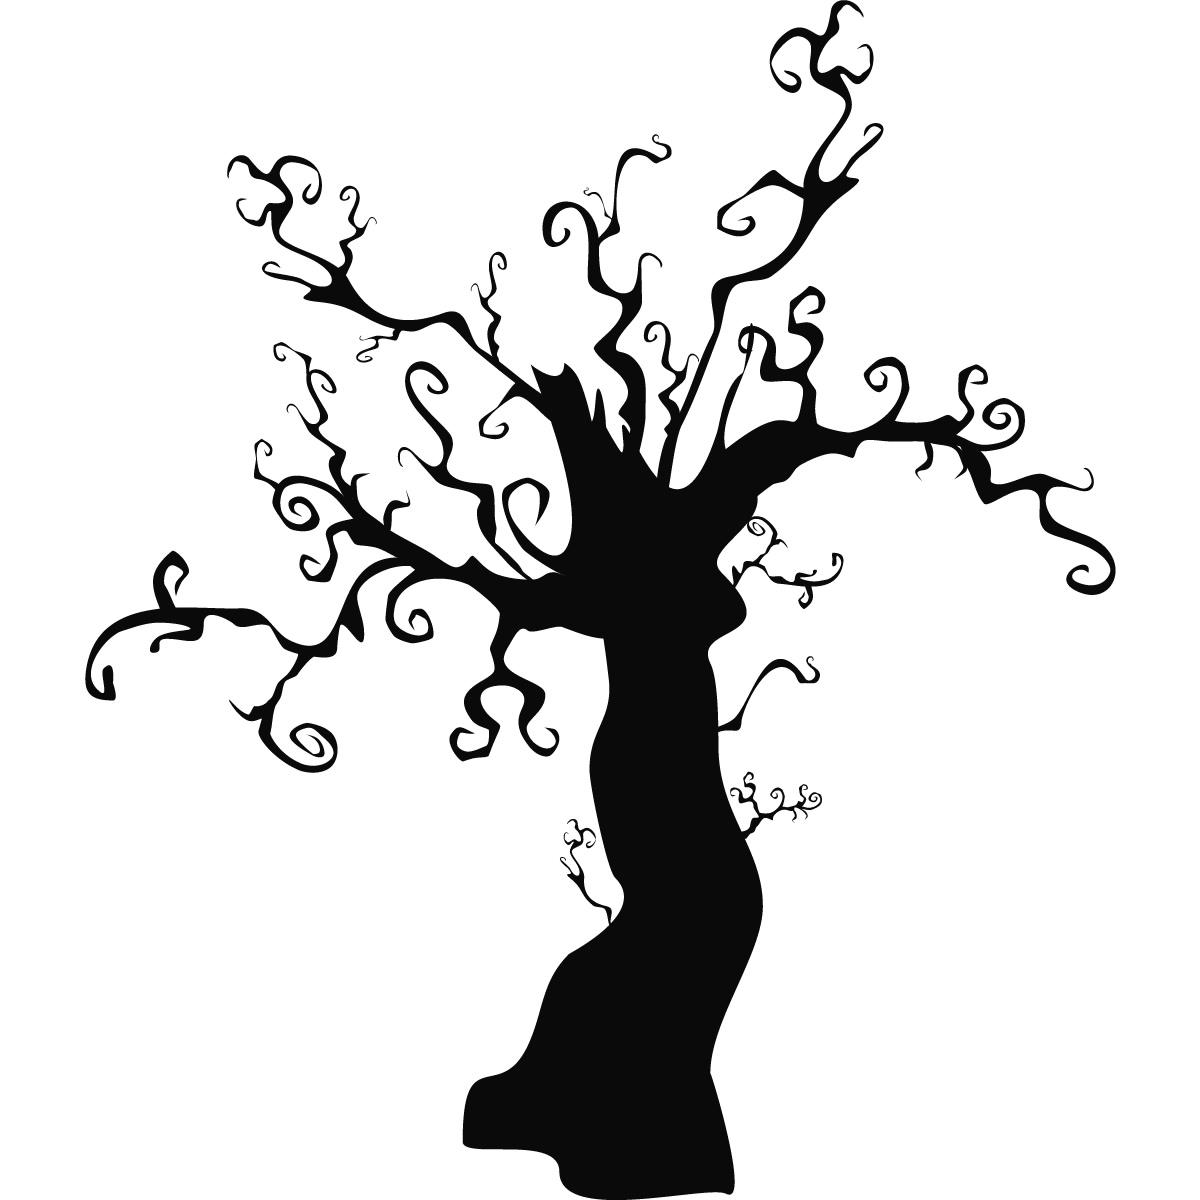 spooky halloween tree silhouette at getdrawings com free for rh getdrawings com Halloween Eye Makeup Clip Art Creepy Eyes Clip Art